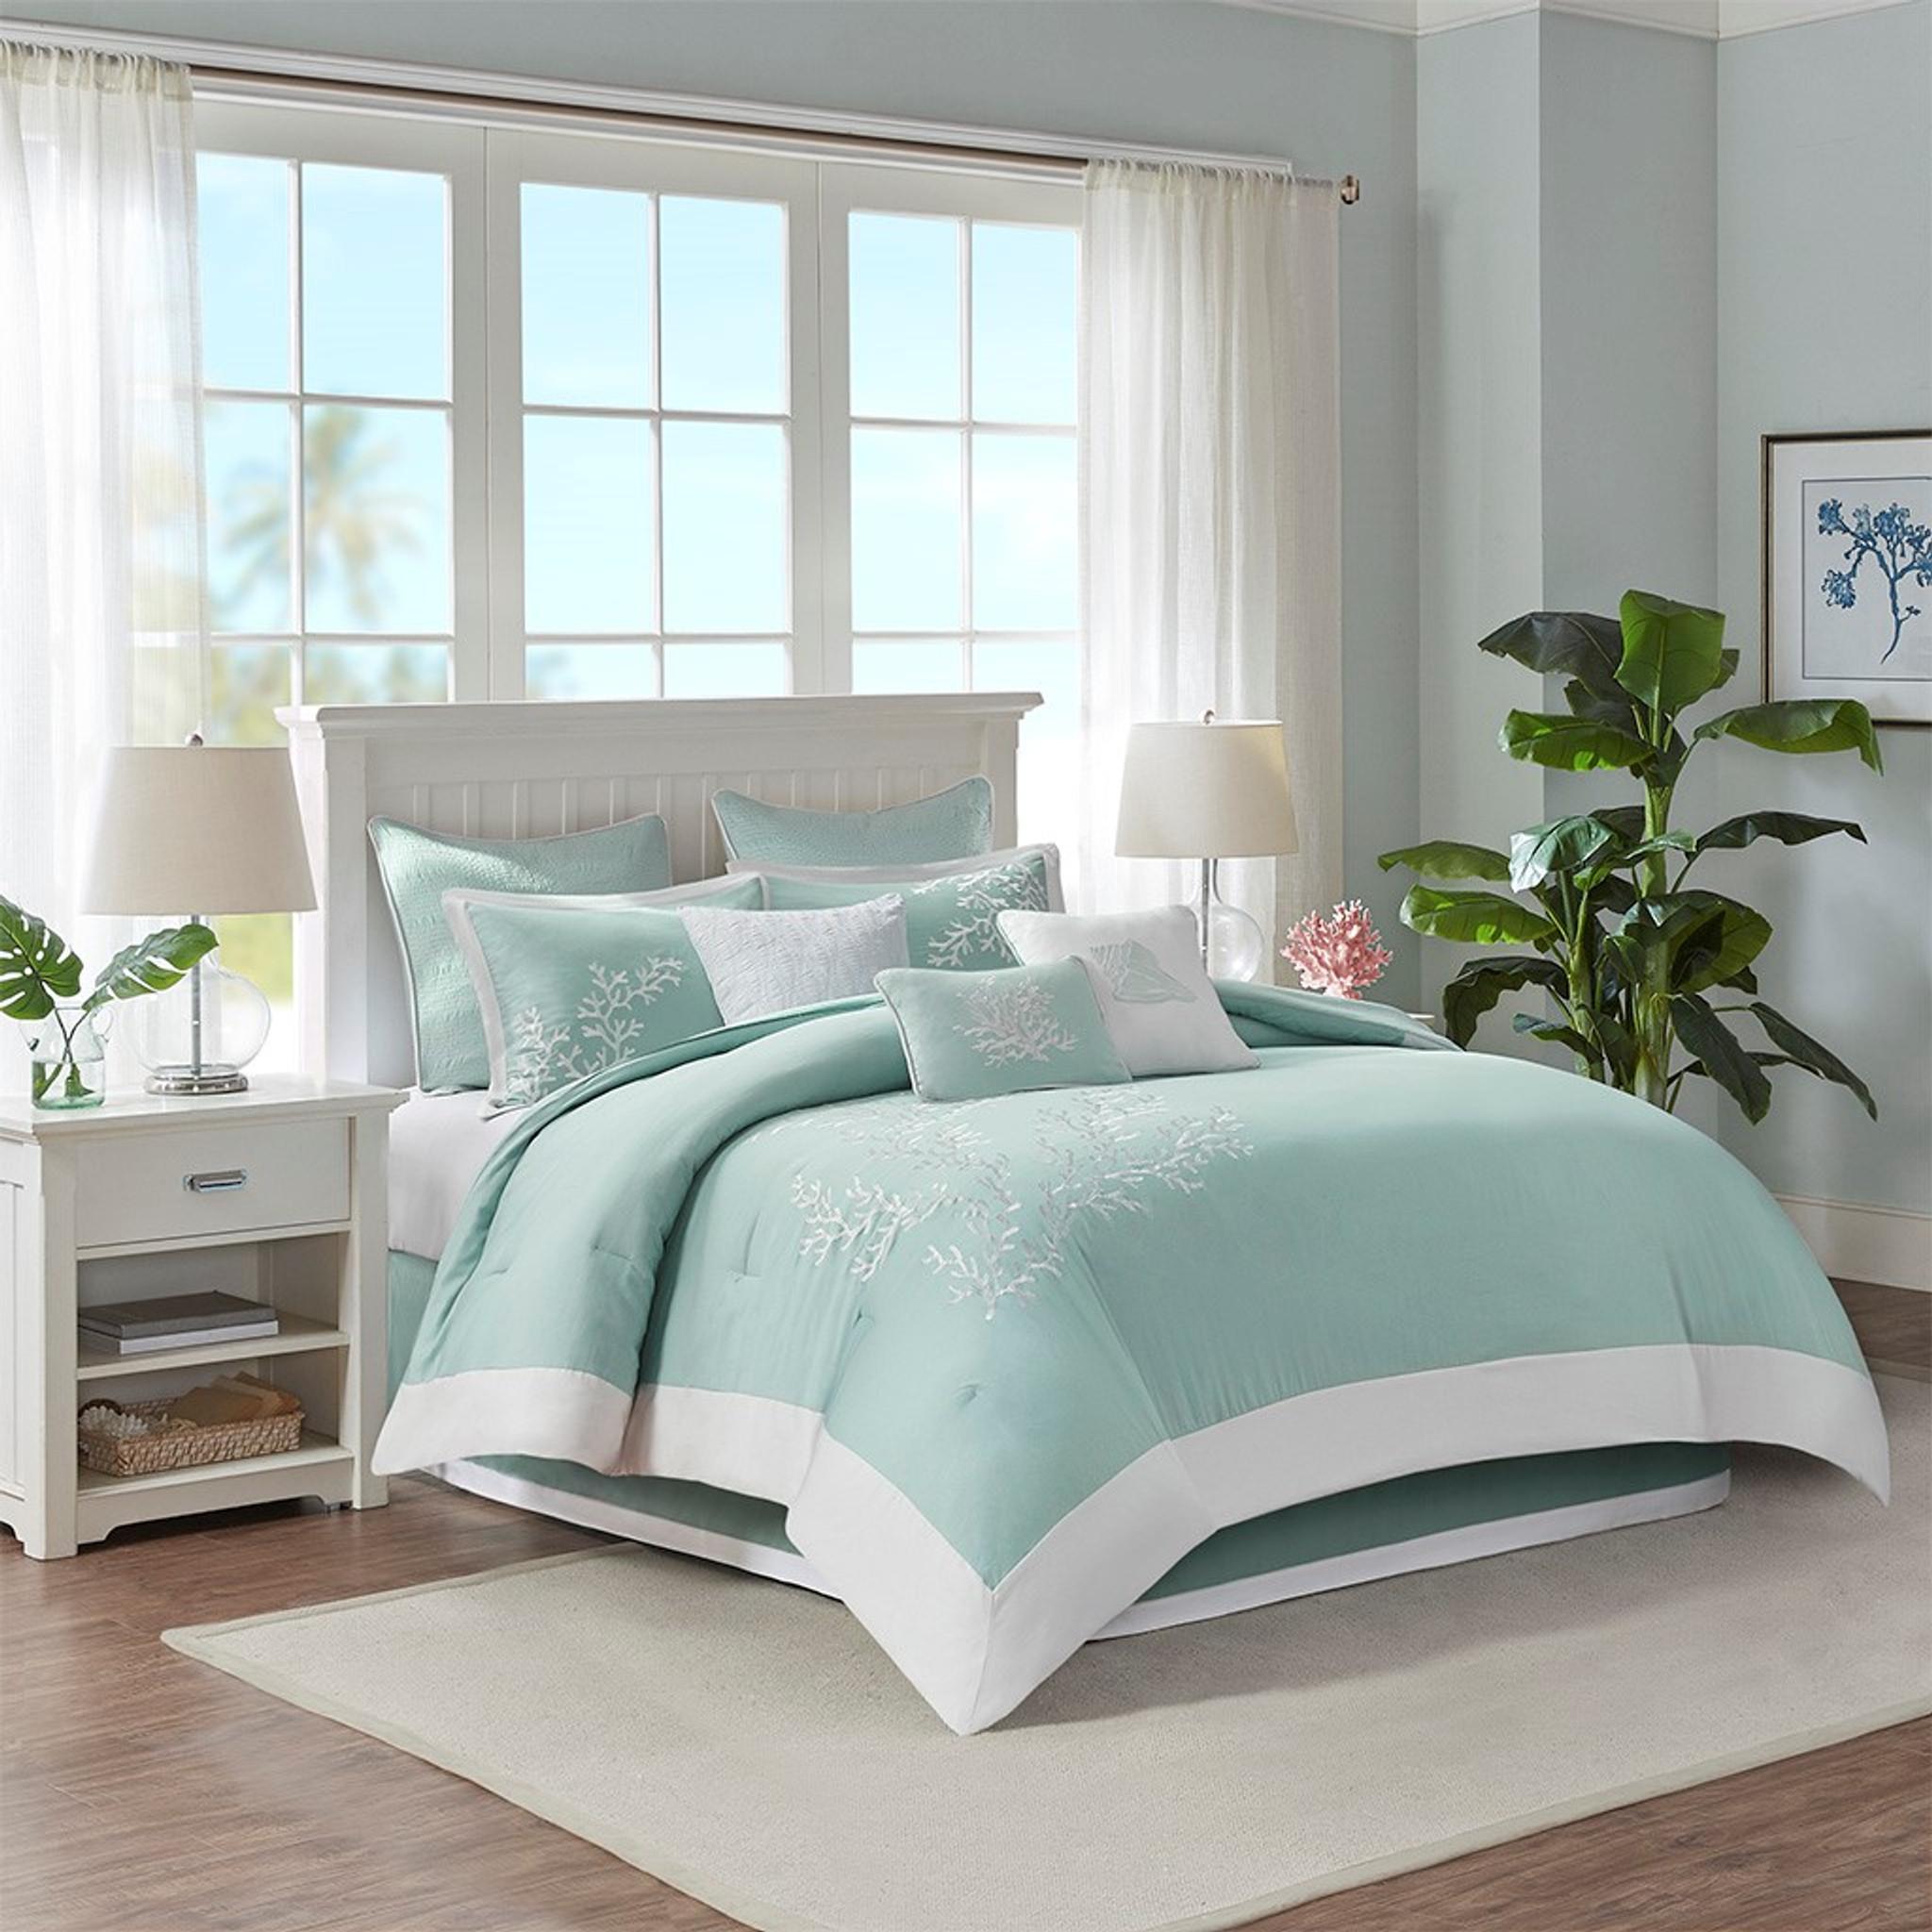 Aqua Blue Coastline Comforter Set Queen Size Caron S Beach House